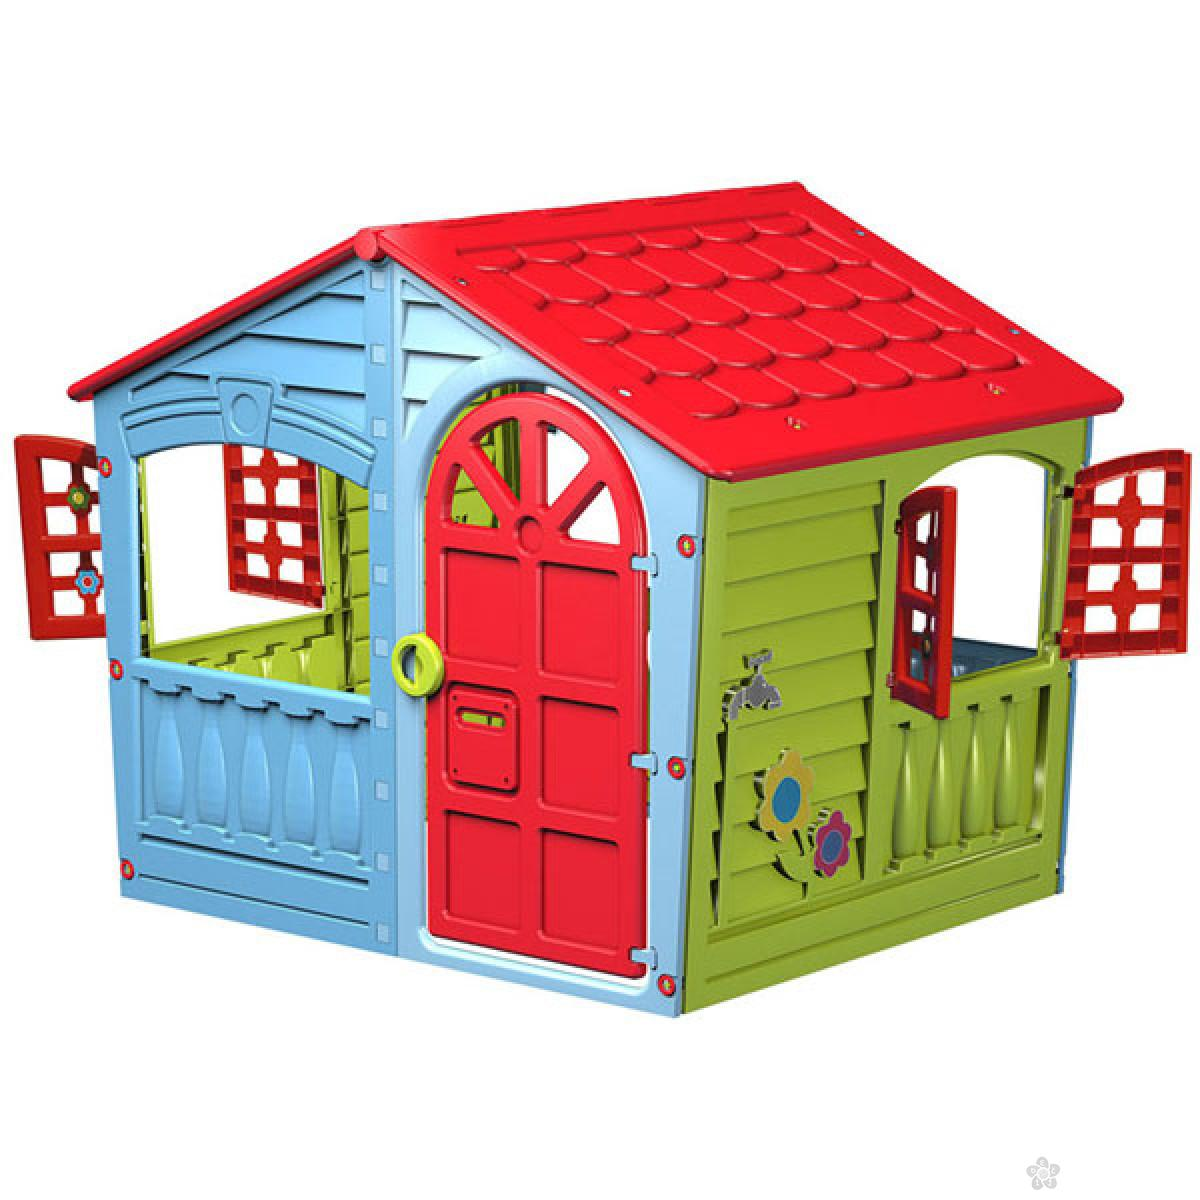 Kućica za decu House of Fun 907801